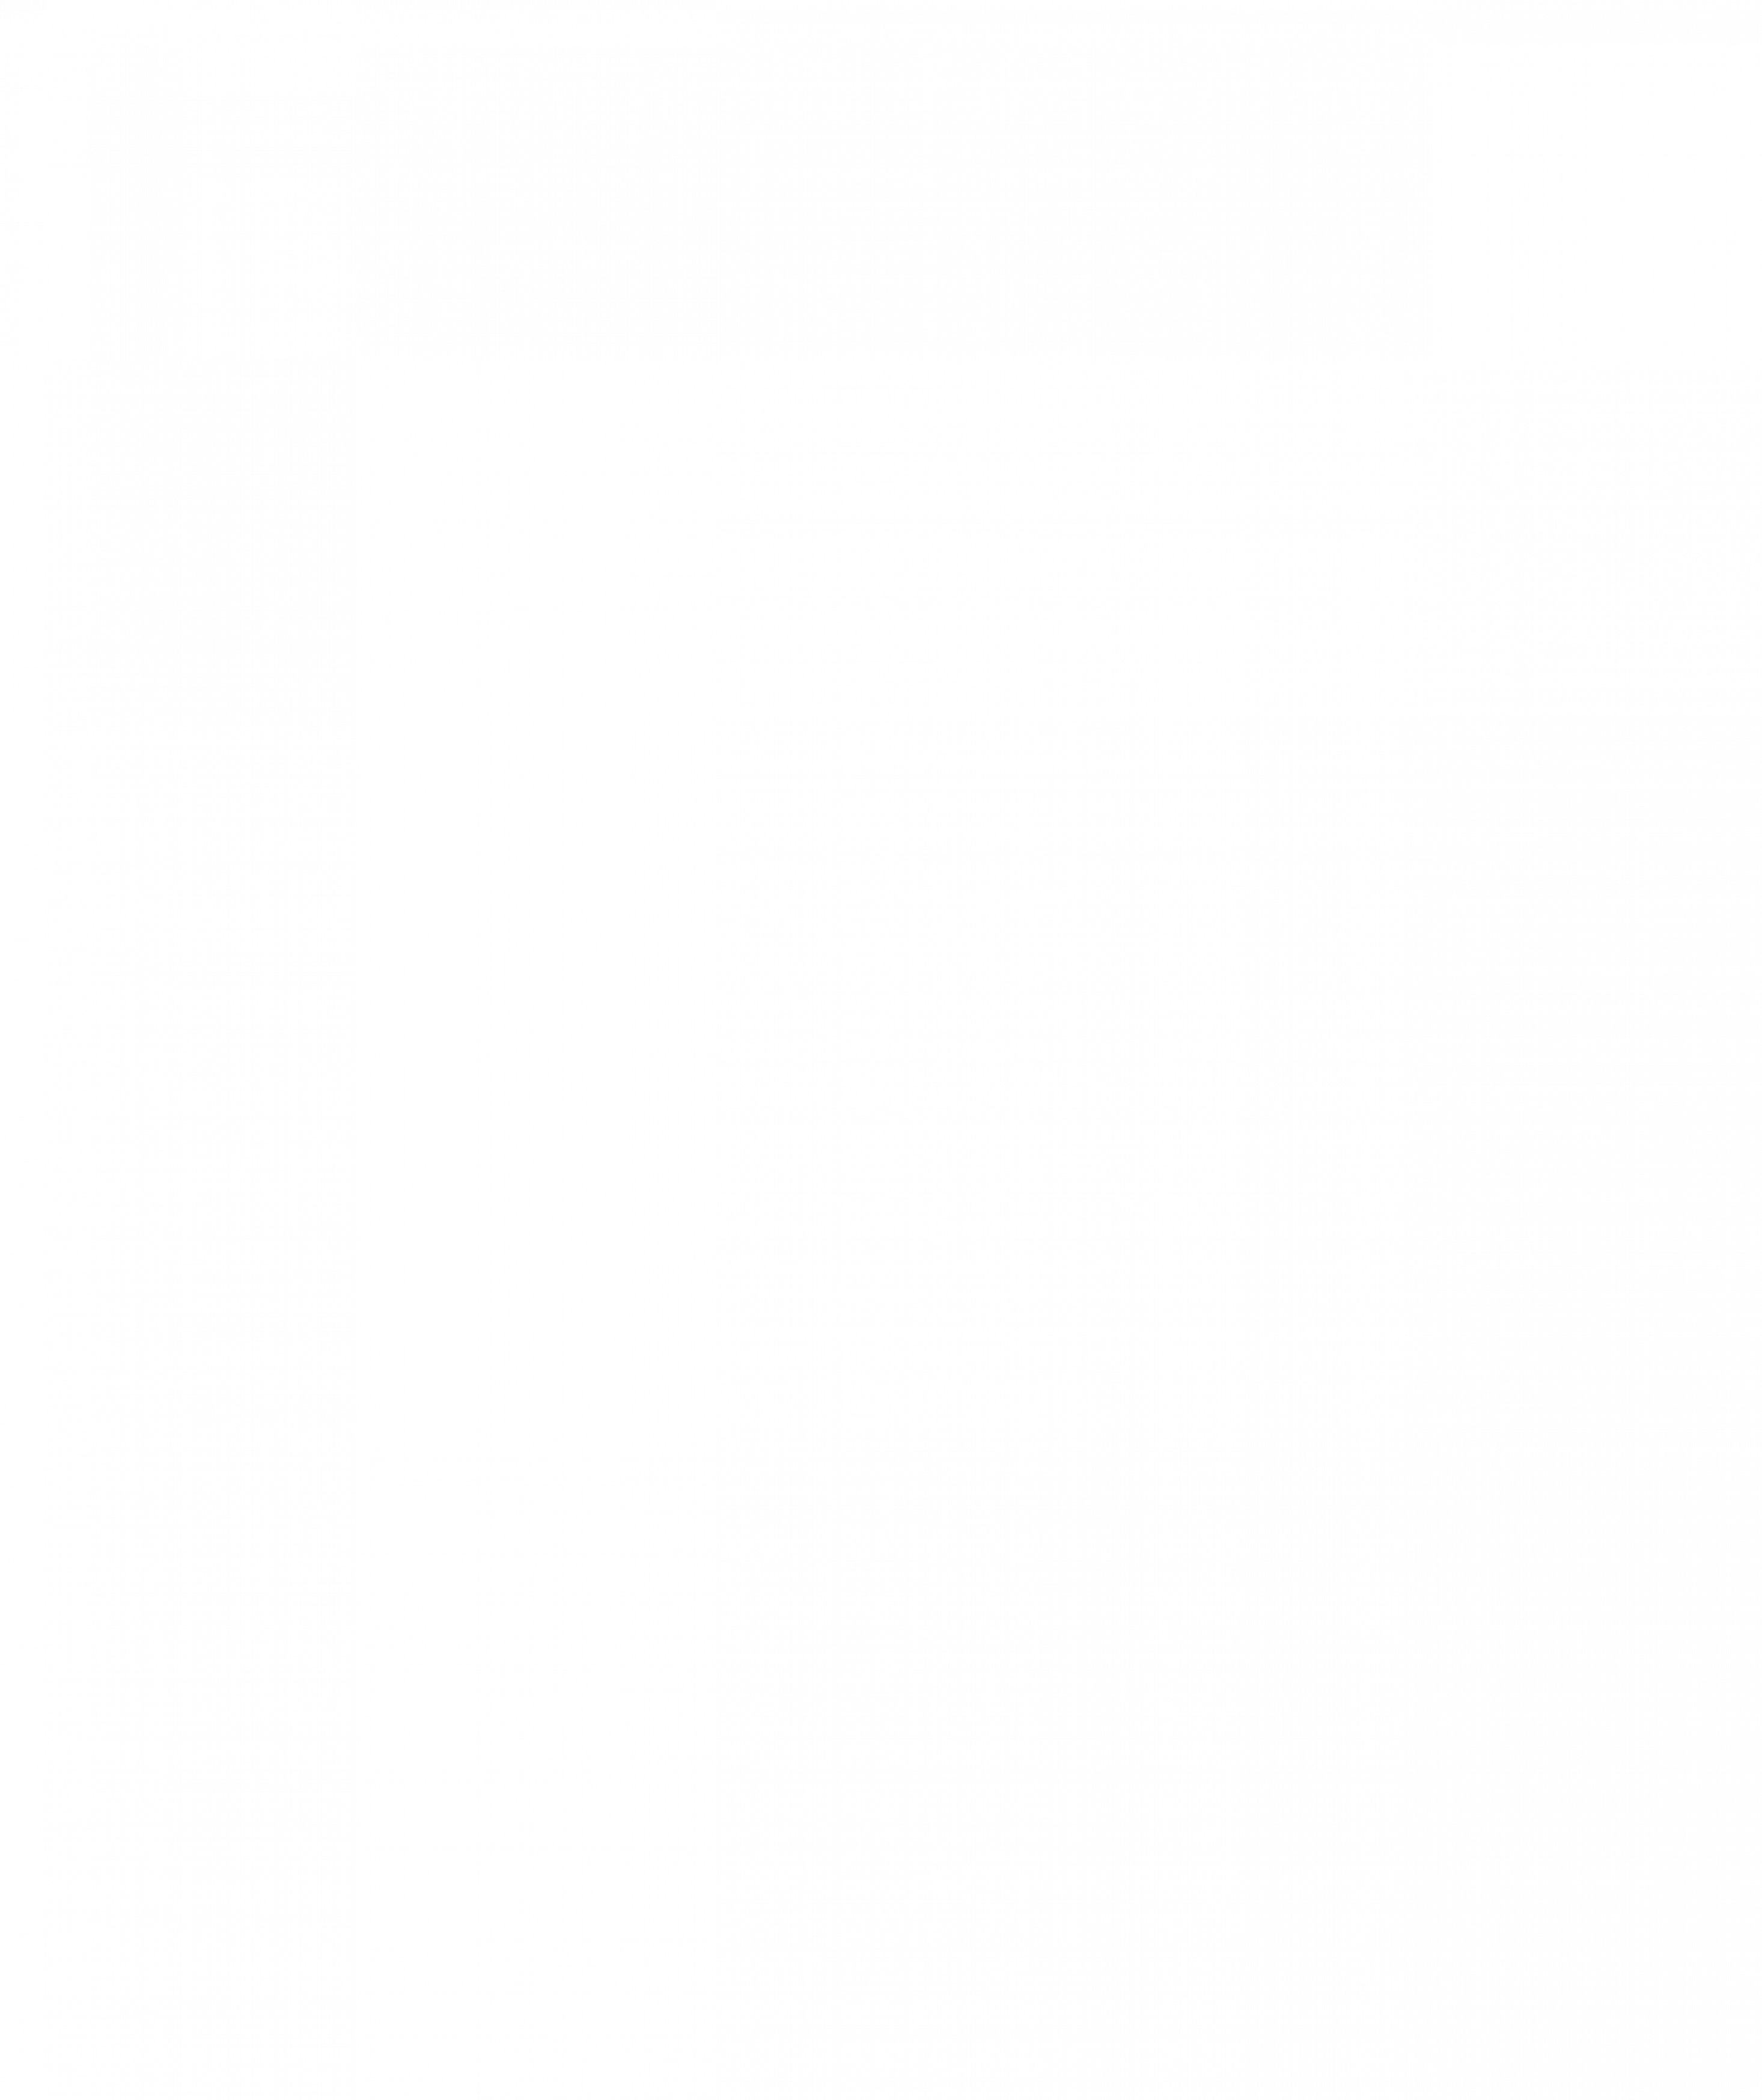 Ciabattabrot / Focacciabrot